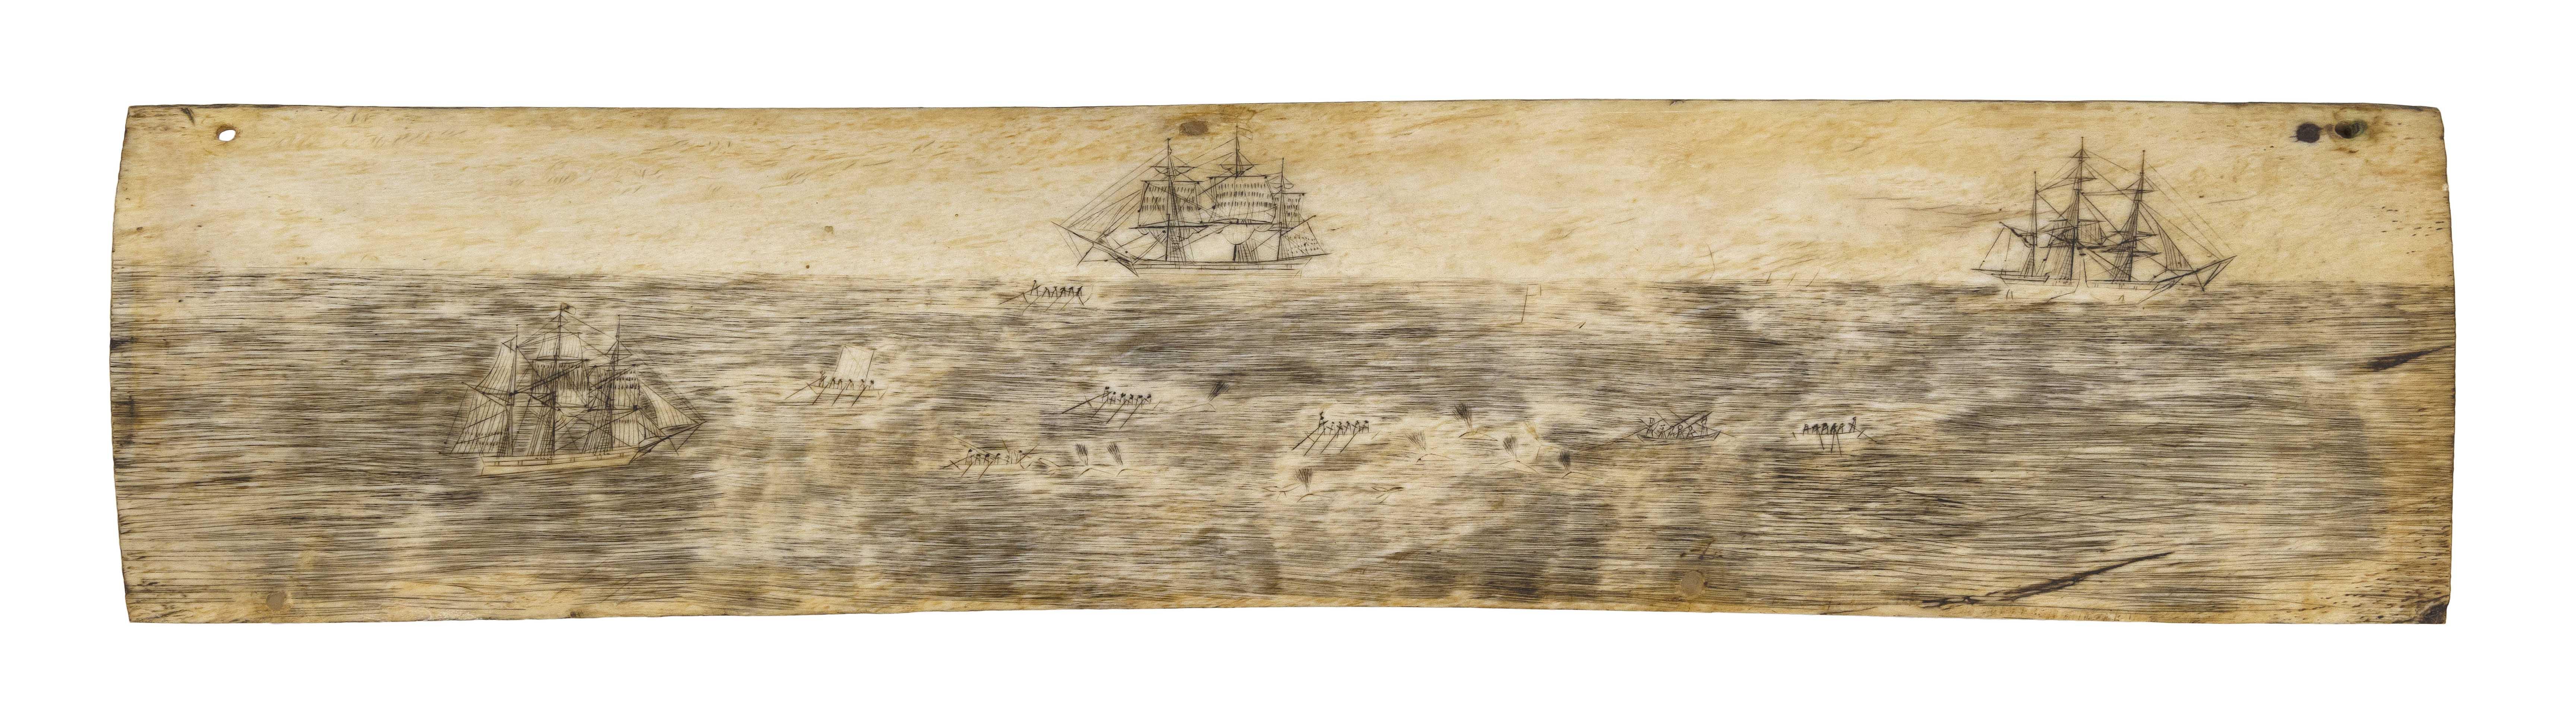 SCRIMSHAW PANBONE PLAQUE Mid-19th Century Approx. 3.5